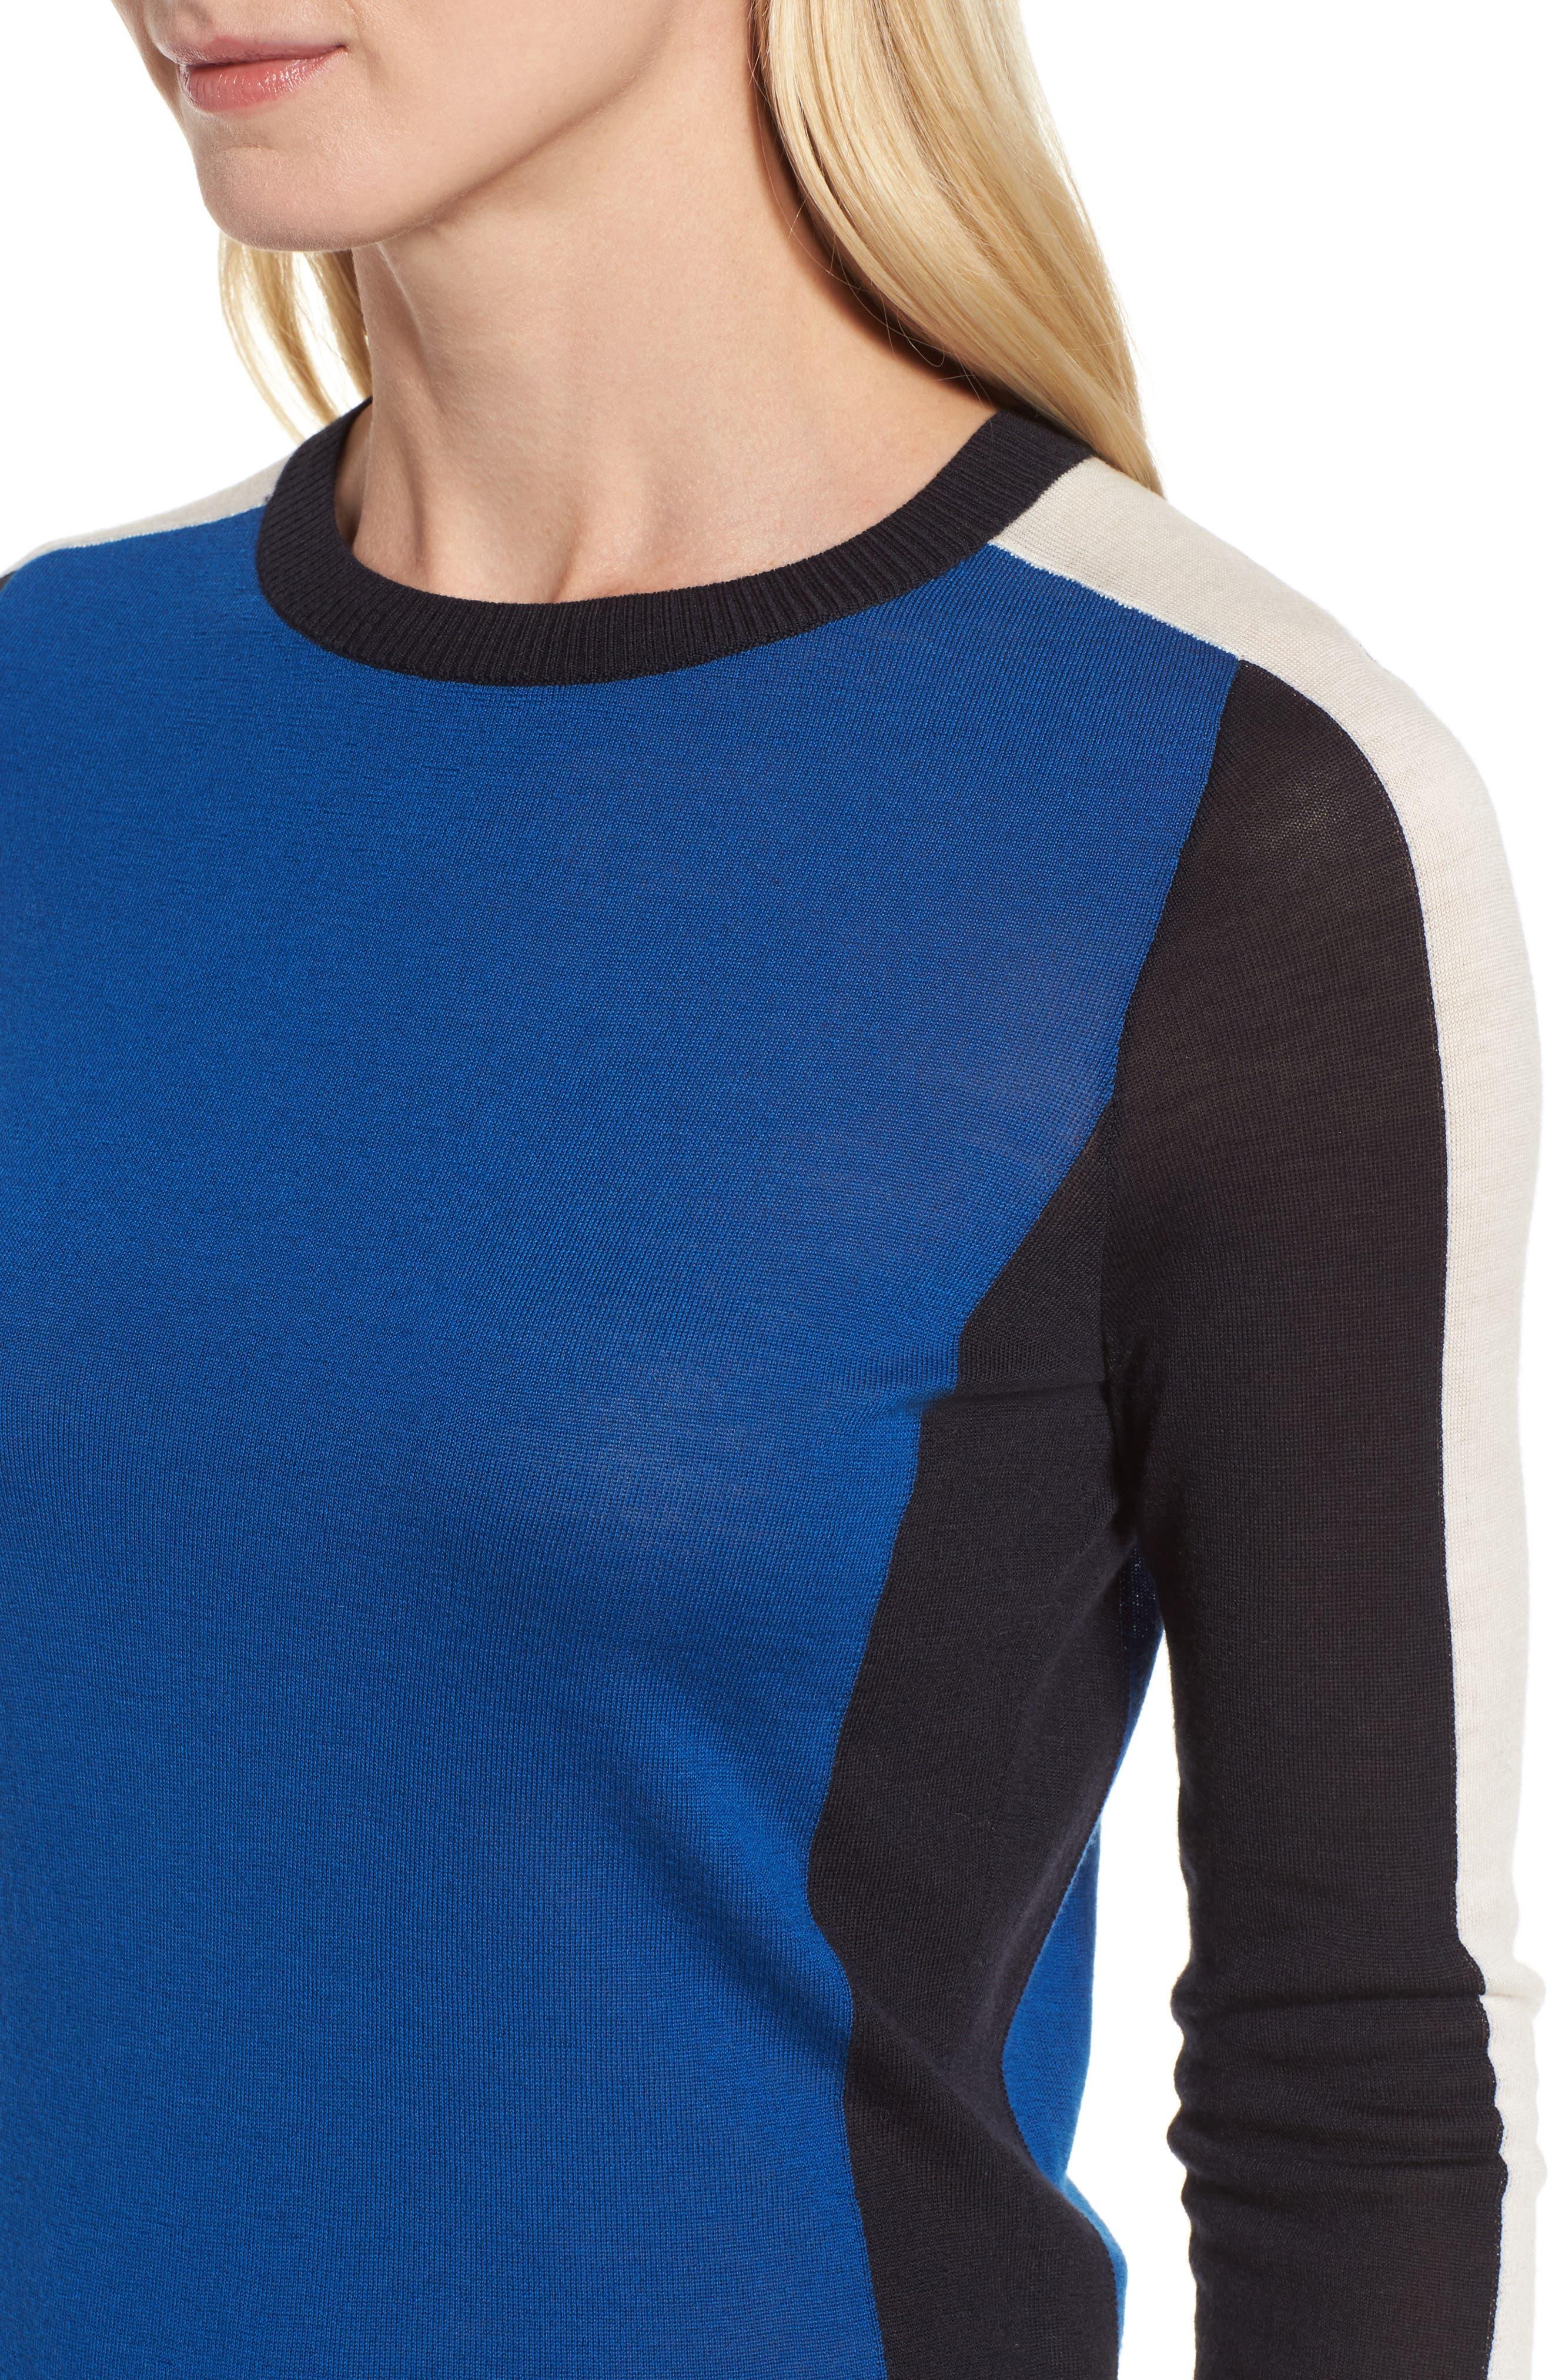 Ferda Colorblock Wool Sweater,                             Alternate thumbnail 4, color,                             471